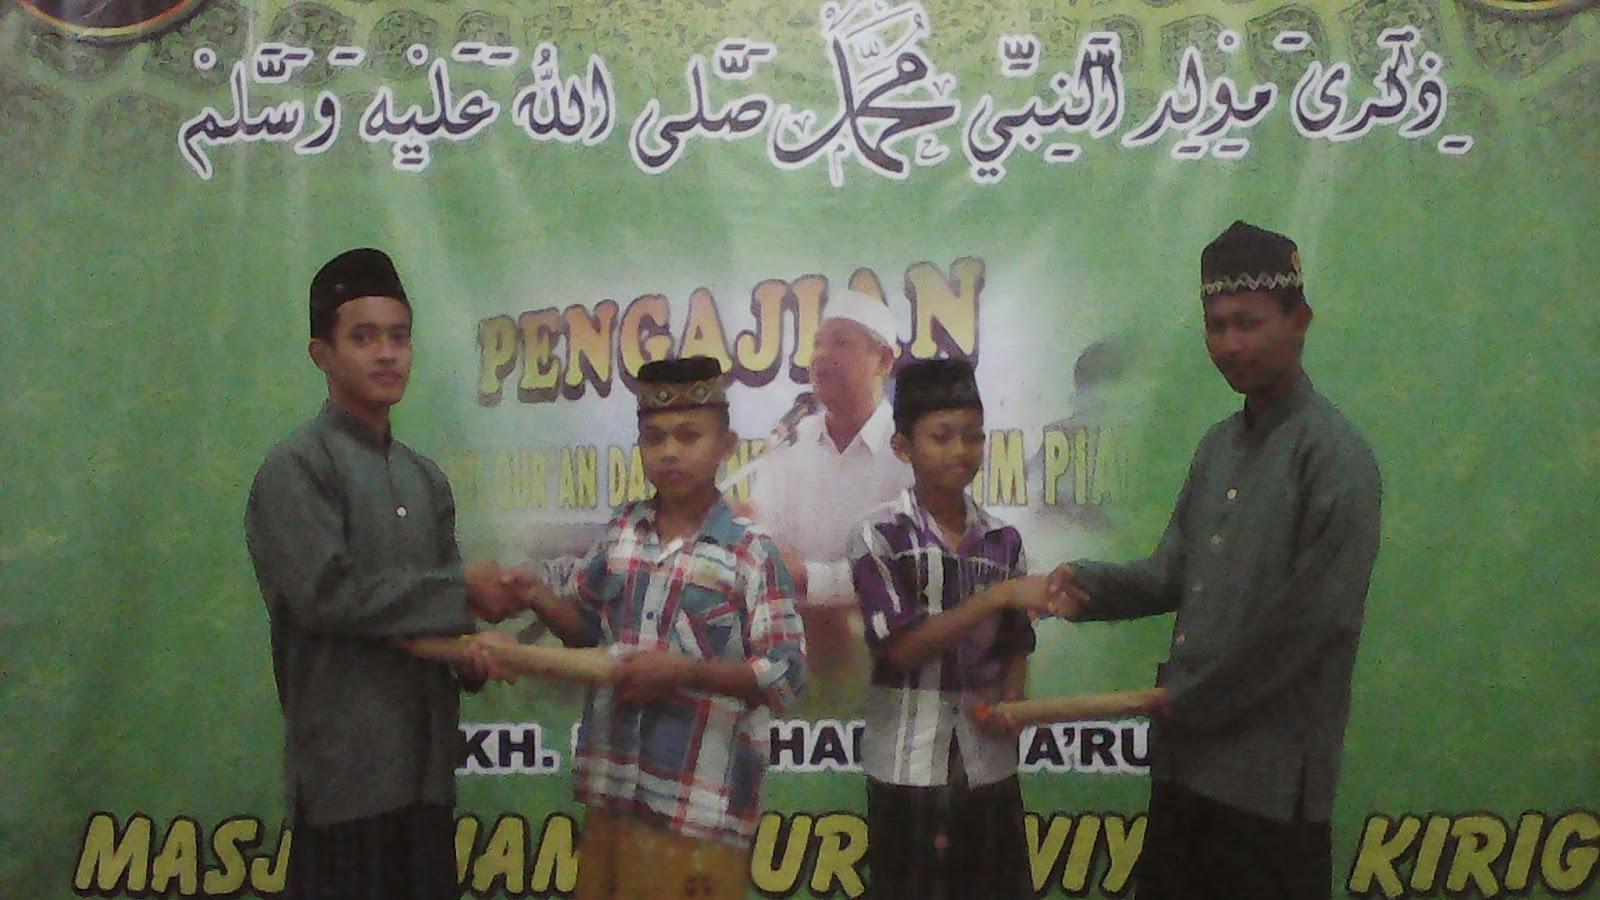 Pemenang Lomba Peringatan Maulid Nabi Muhammad SAW Desa Kirig